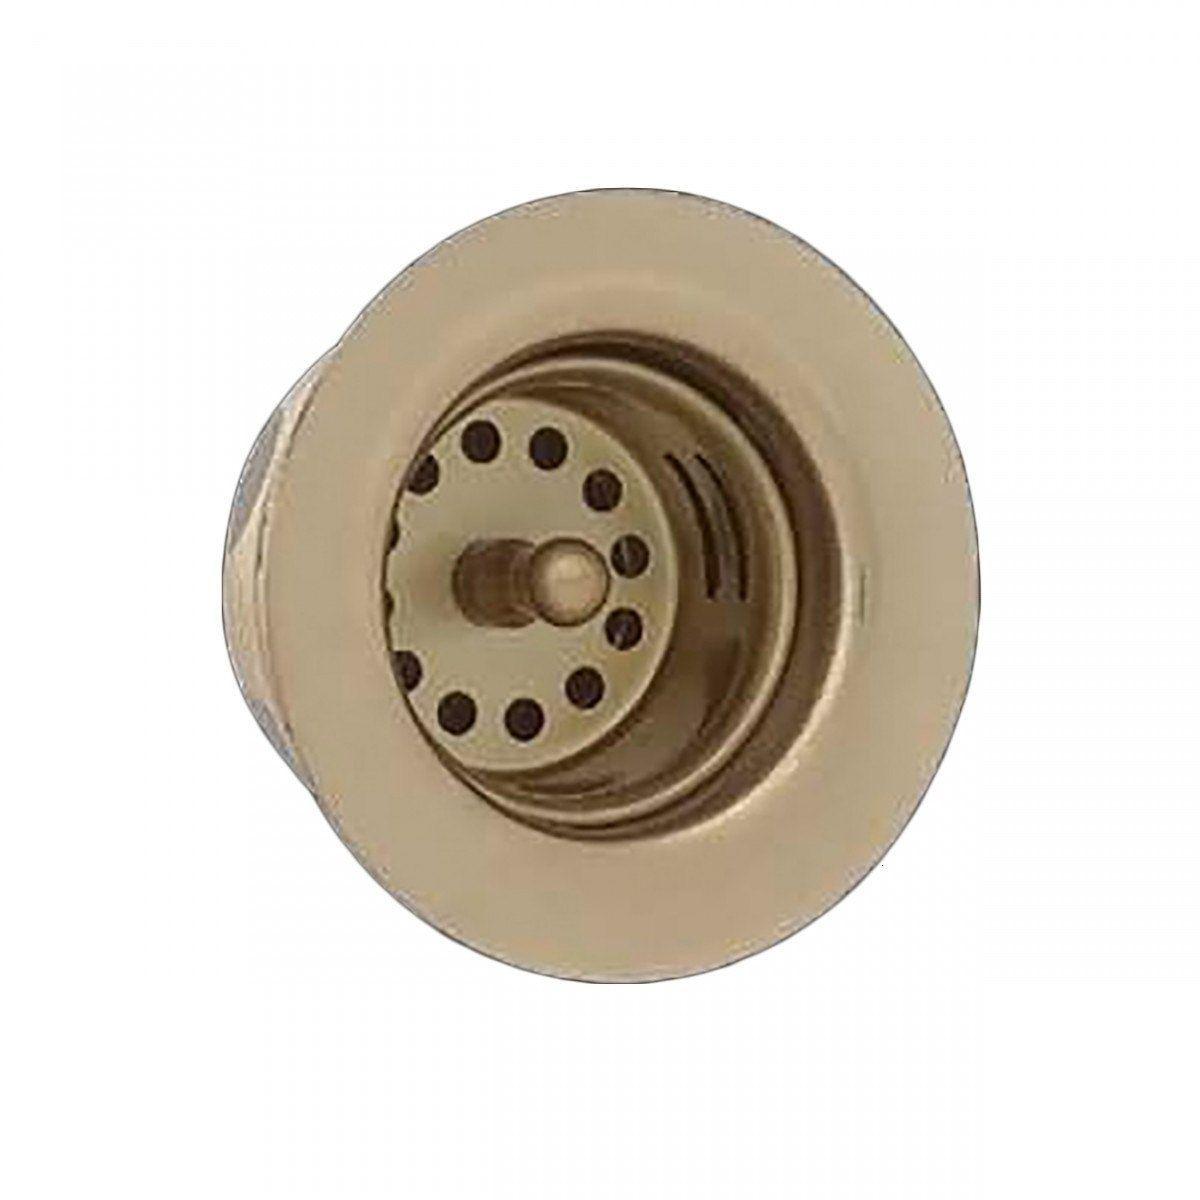 Bar Sink Strainer - Solid Bright Brass - 2-7/8 Drains | Renovator\'s ...